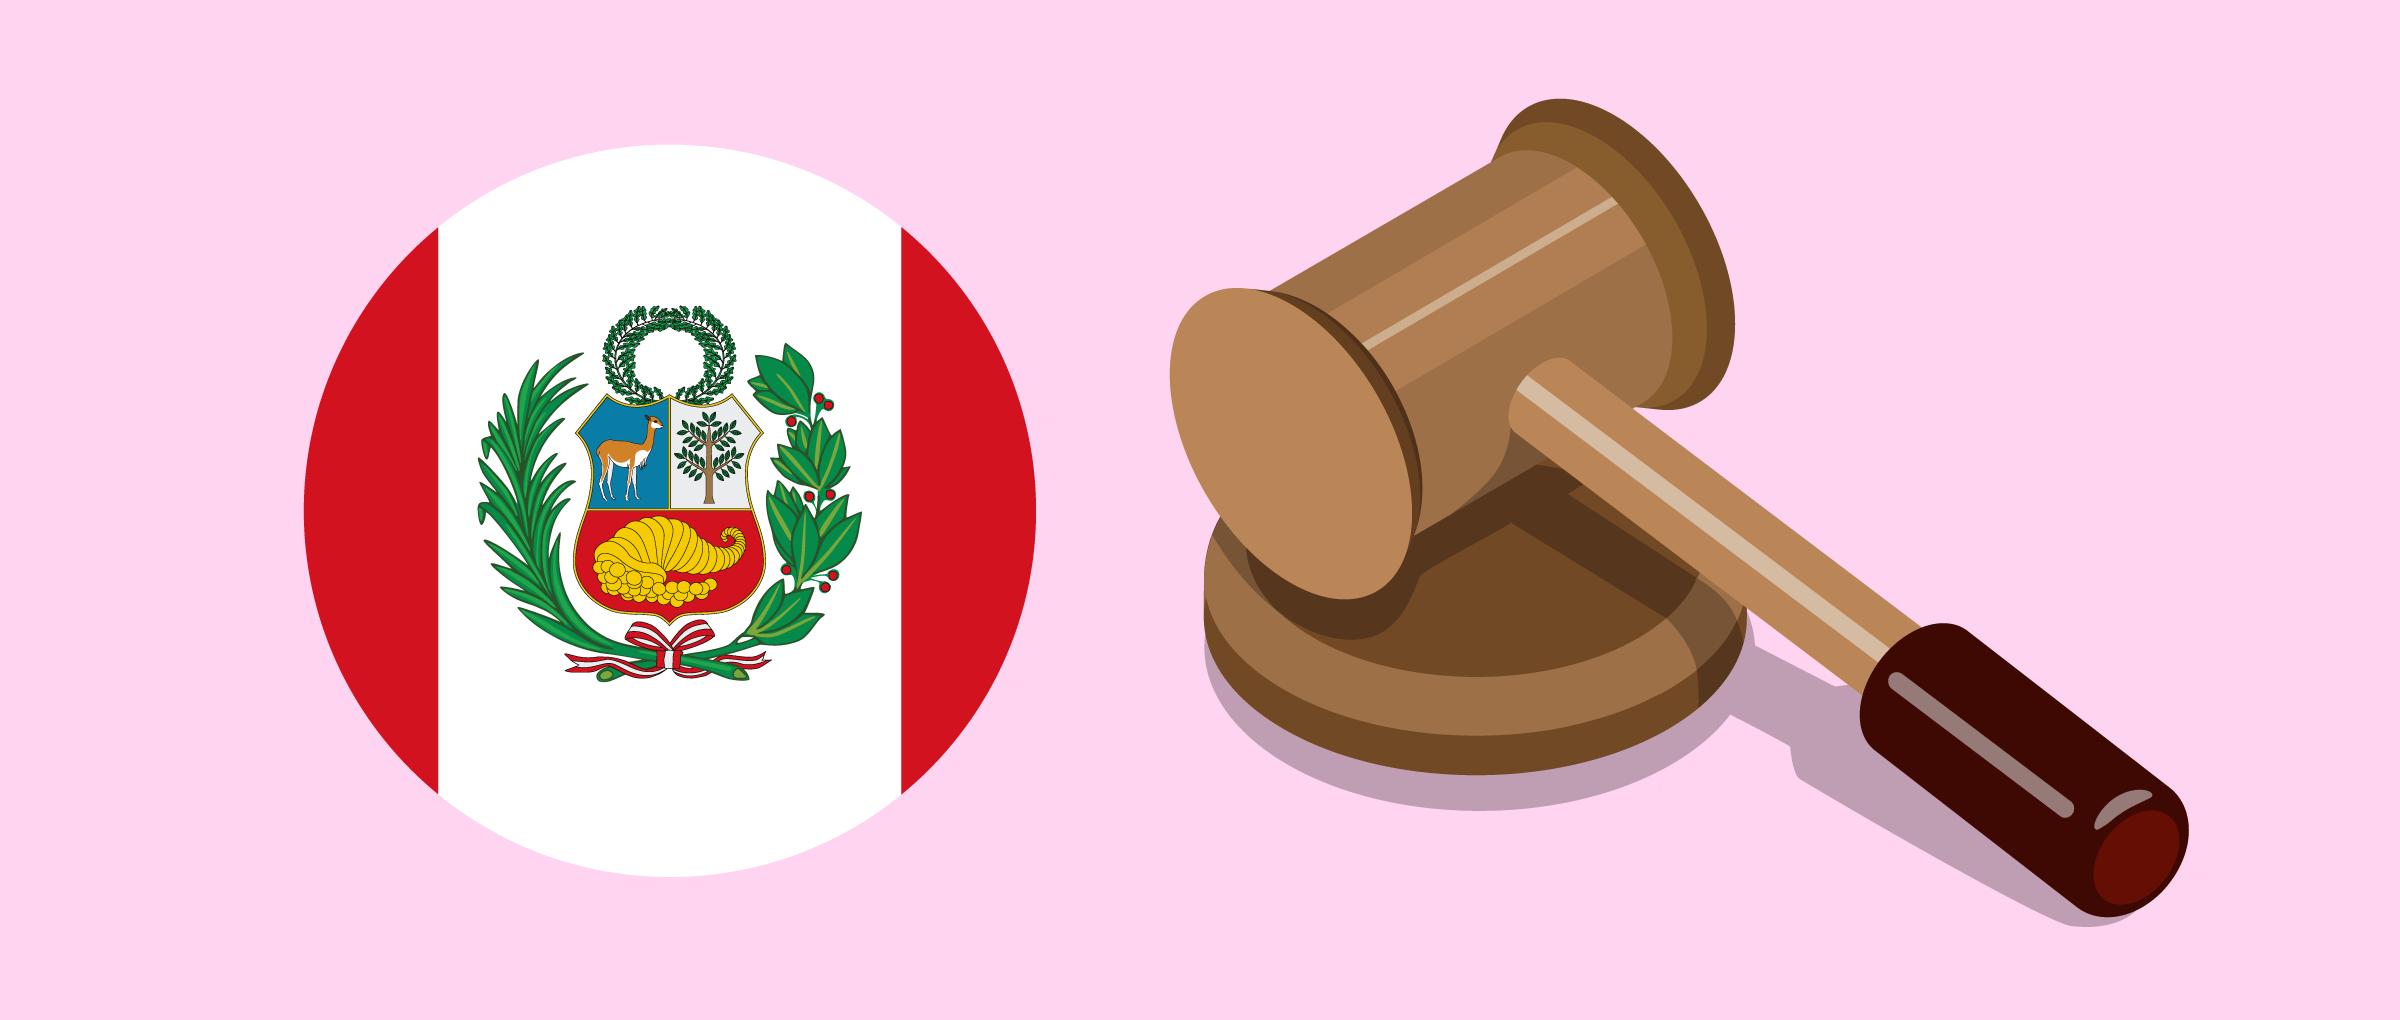 Peruanische Gesetzgebung zur assistierten Reproduktion